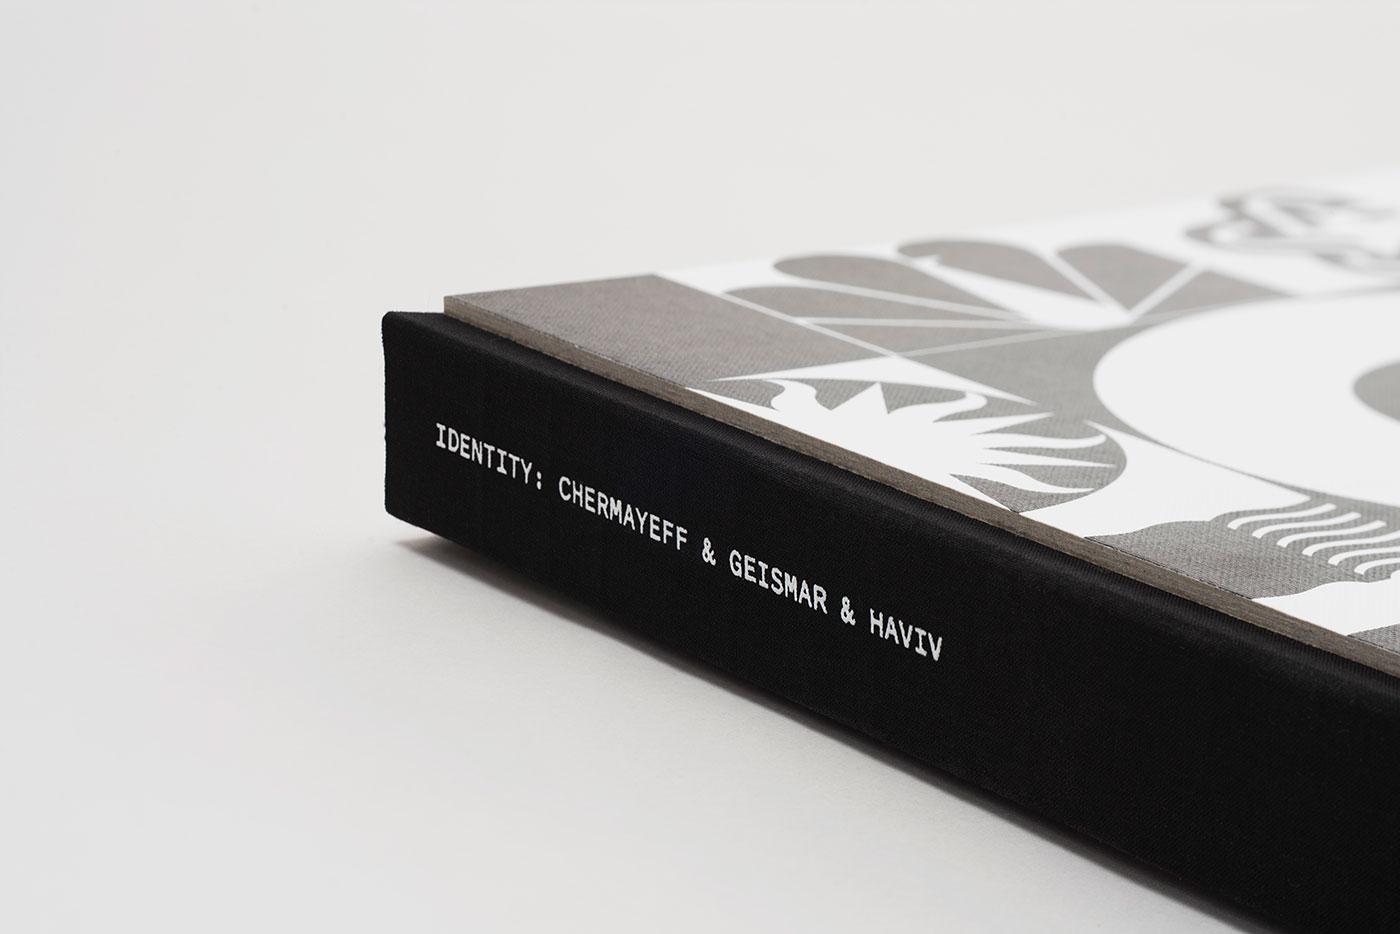 Chermayeff & Geismar & Haviv, Standards Manual